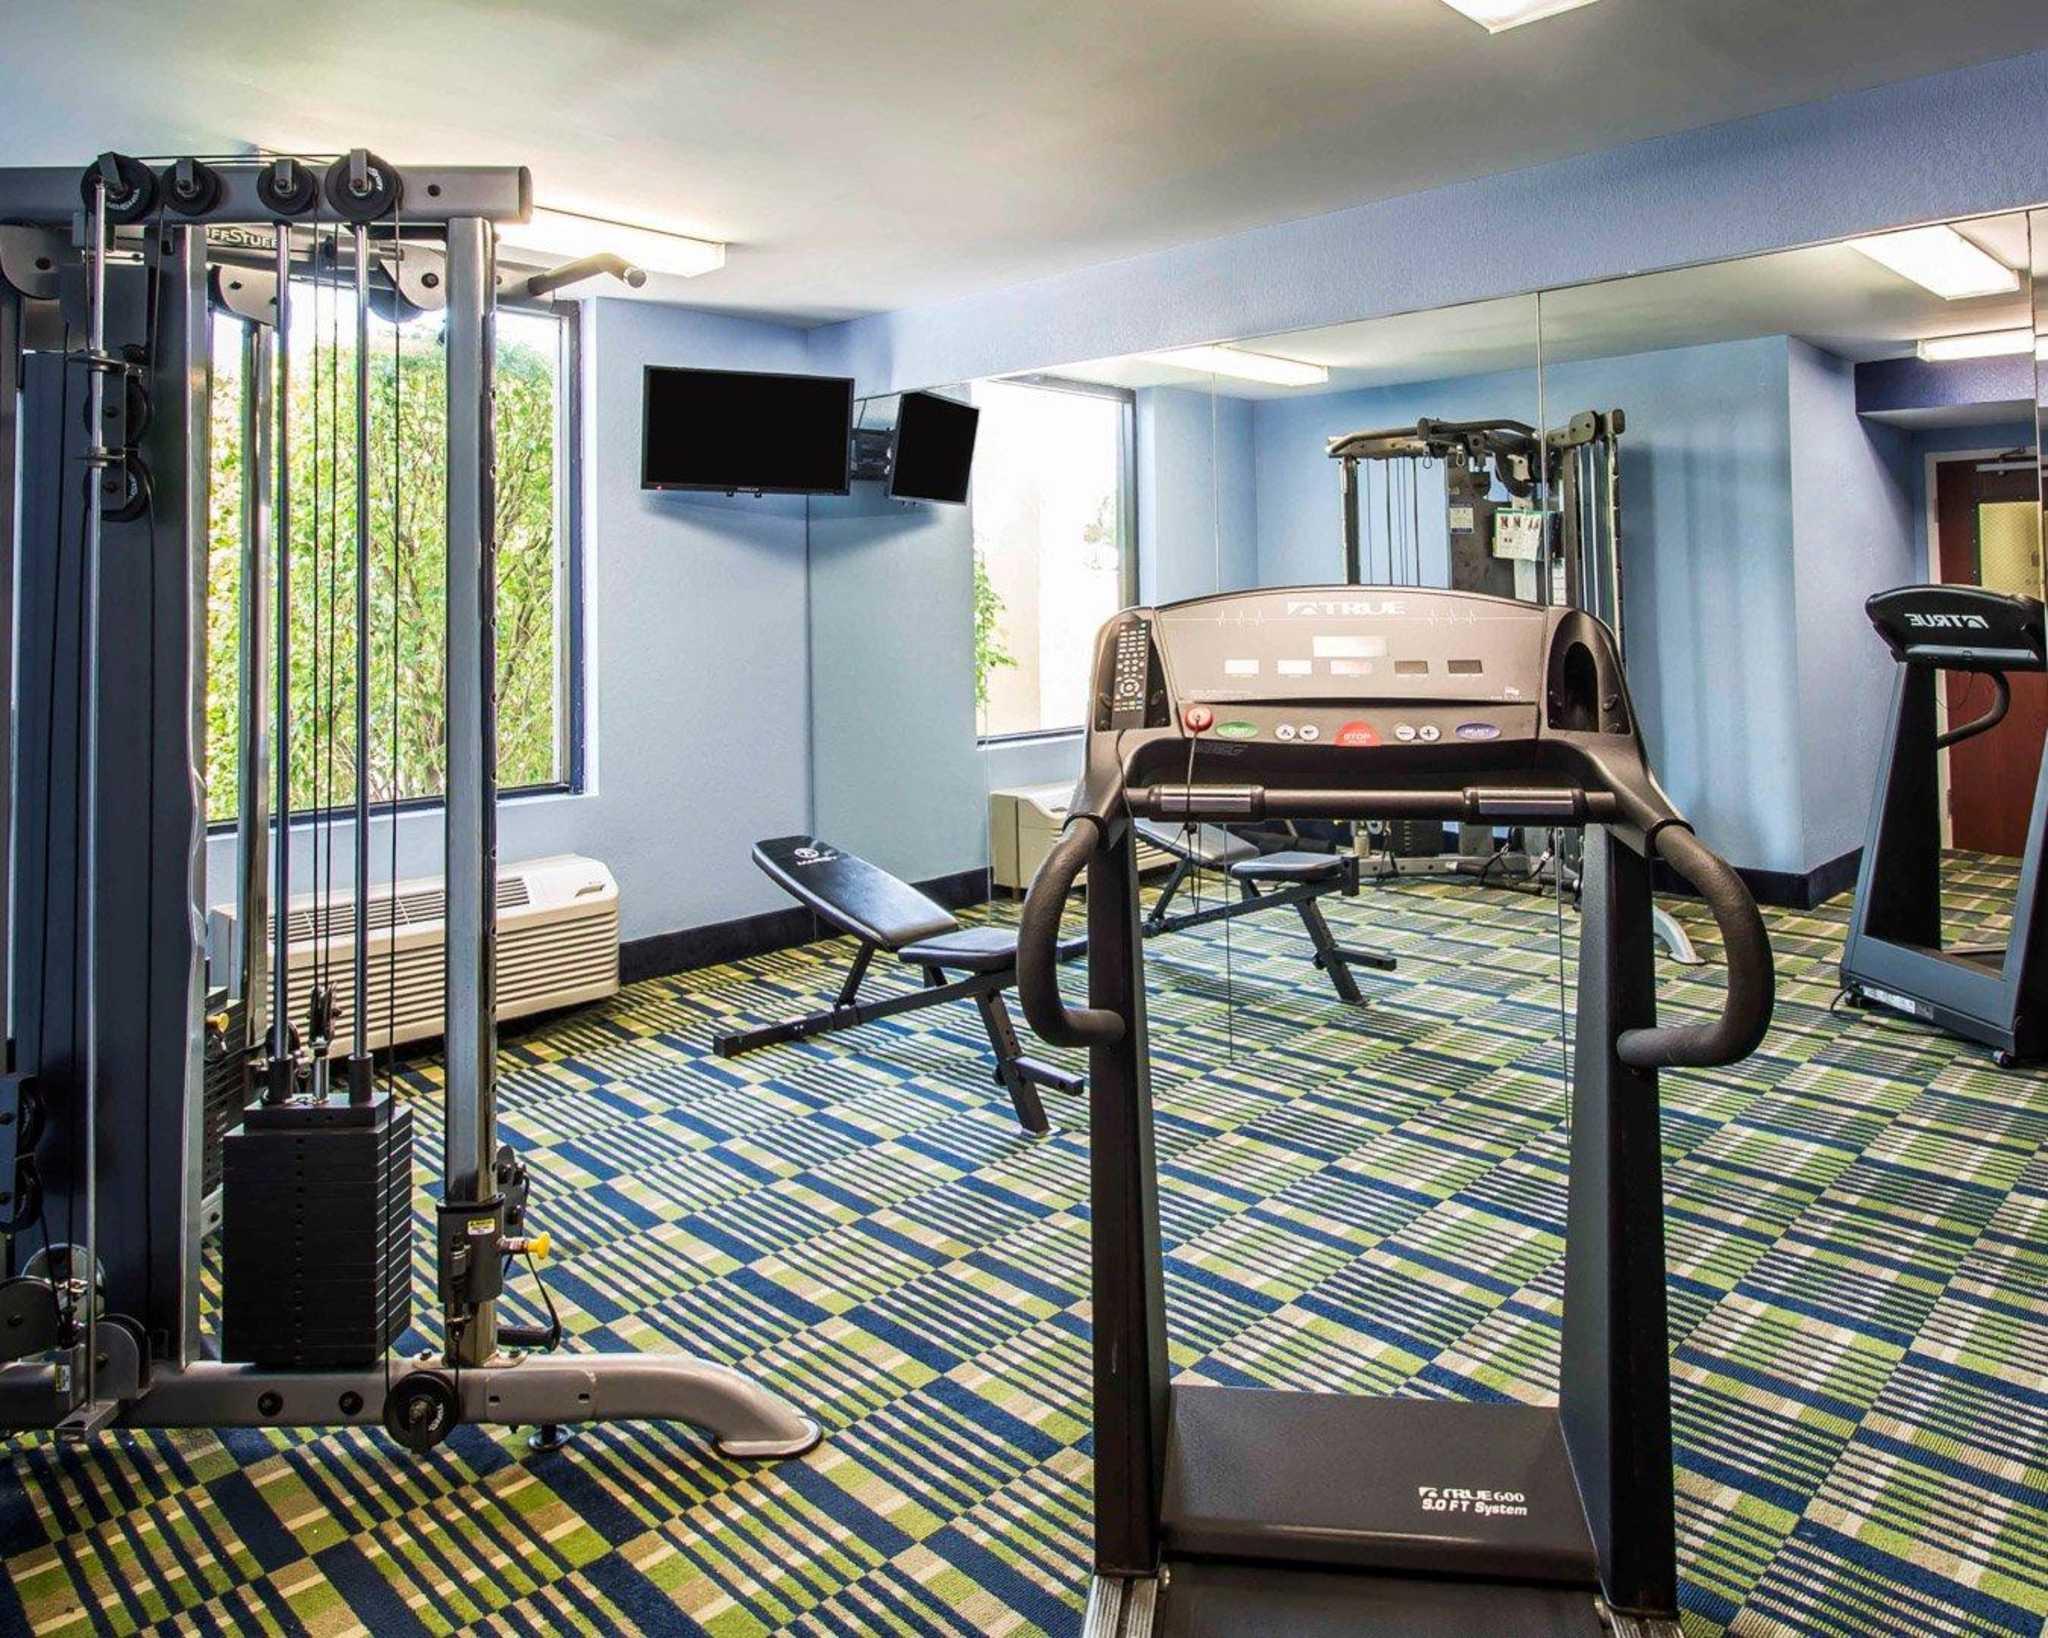 Comfort Inn & Suites Lantana - West Palm Beach South image 33